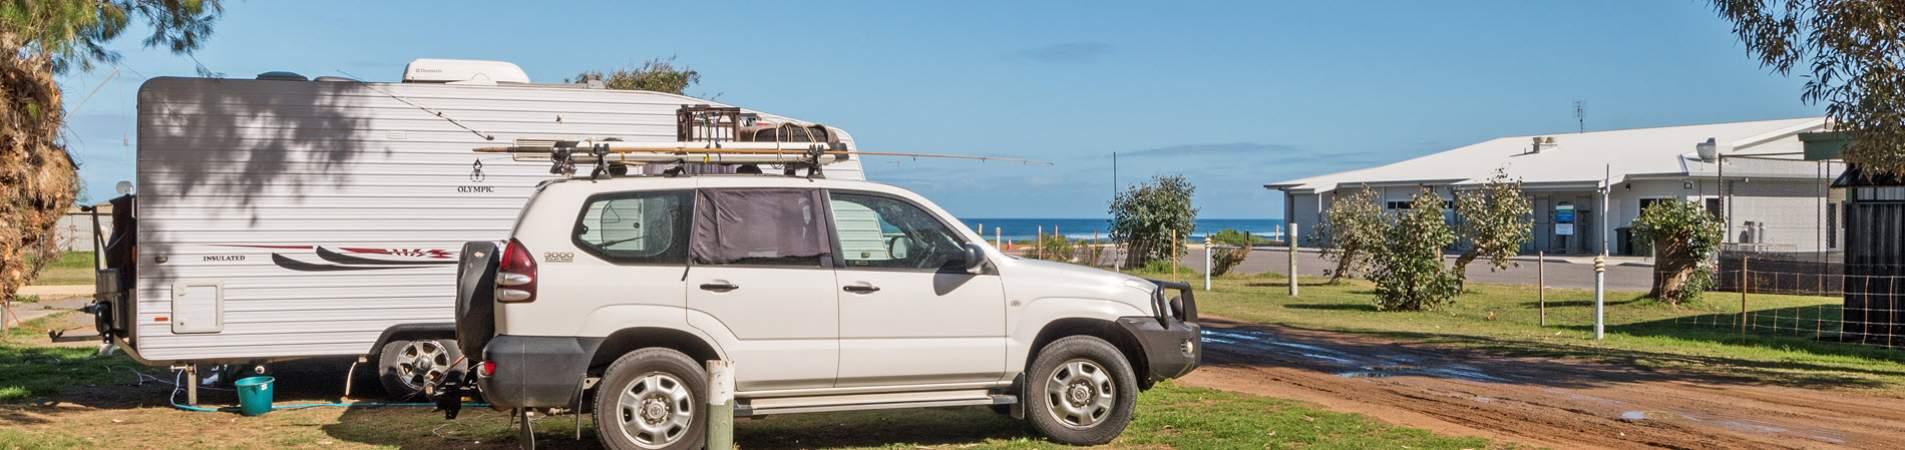 horrocks beach caravan park accommodation - banner 2